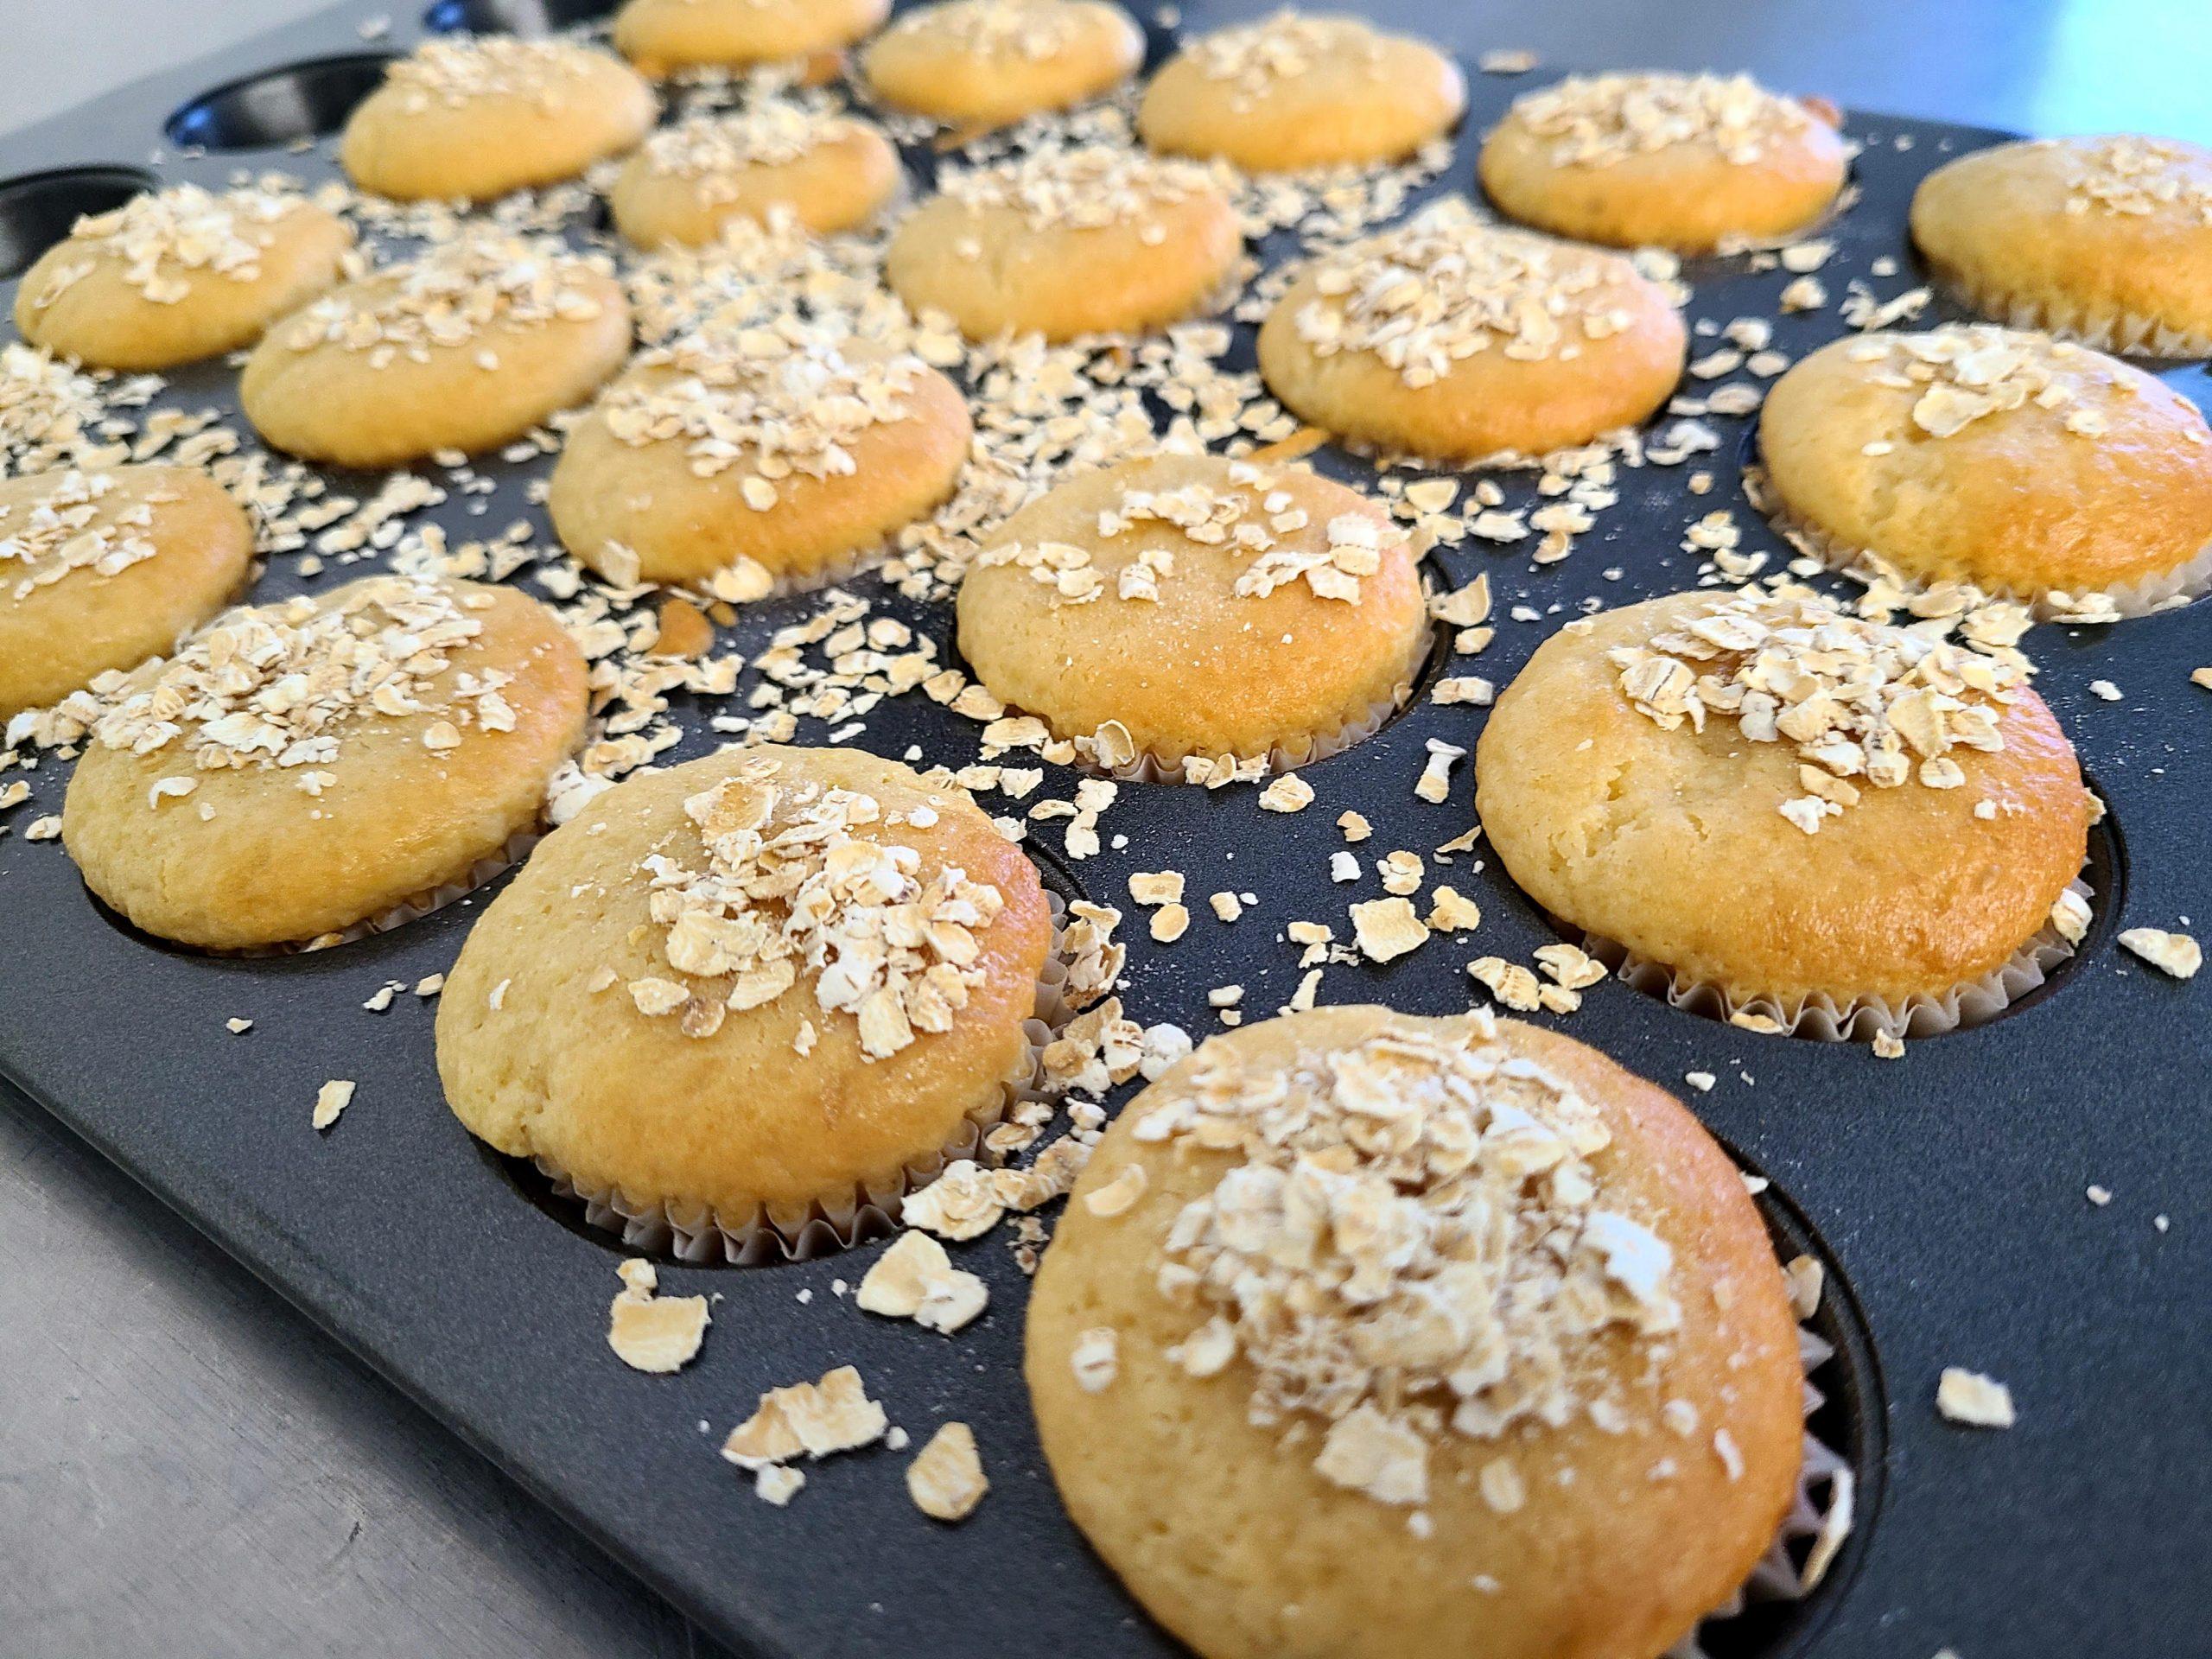 Mini Pastry Delights